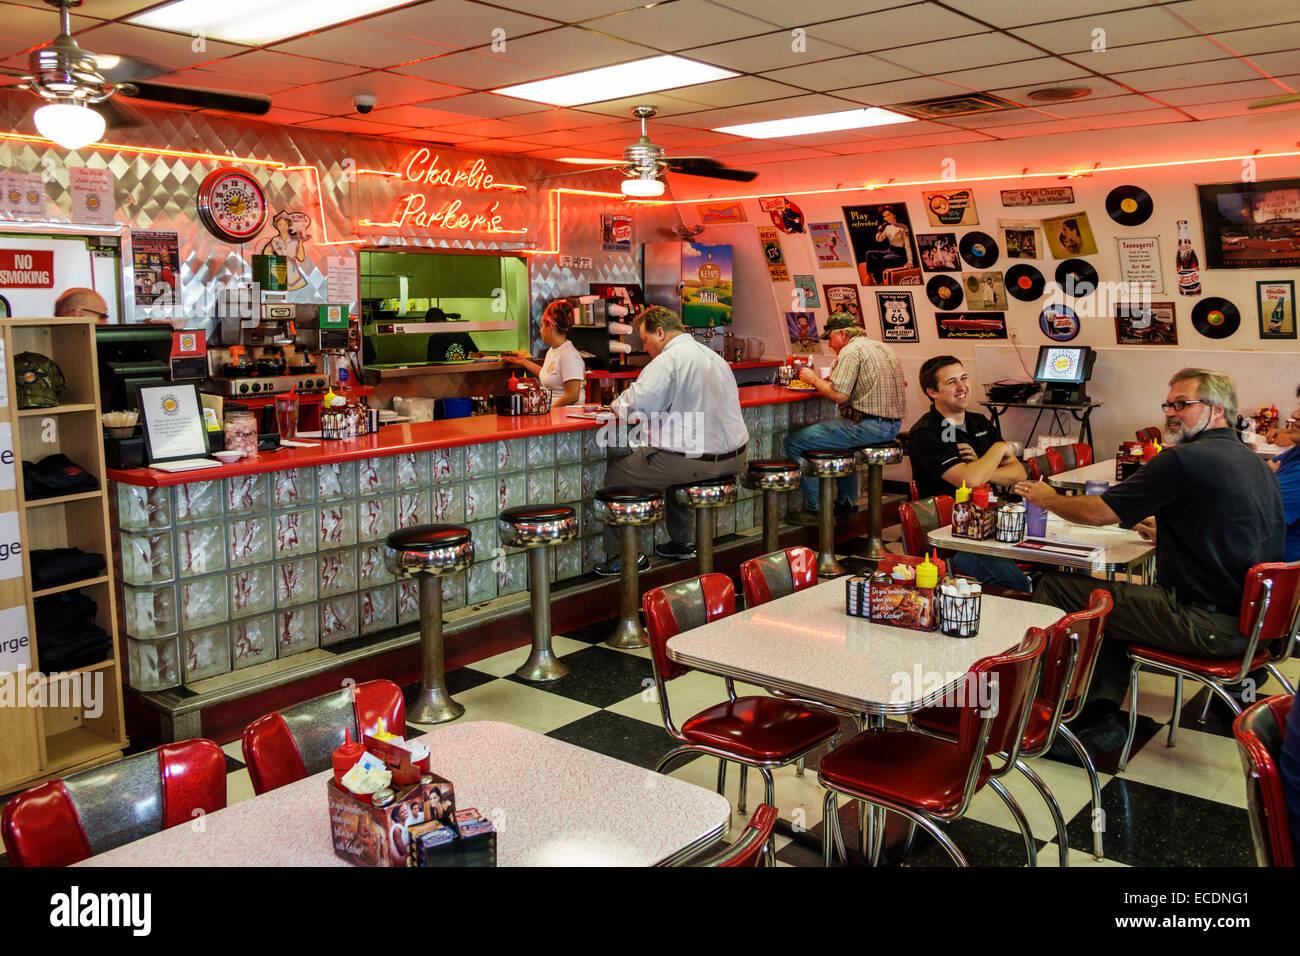 American Diner Interior Eating Stockfotos & American Diner Interior ...